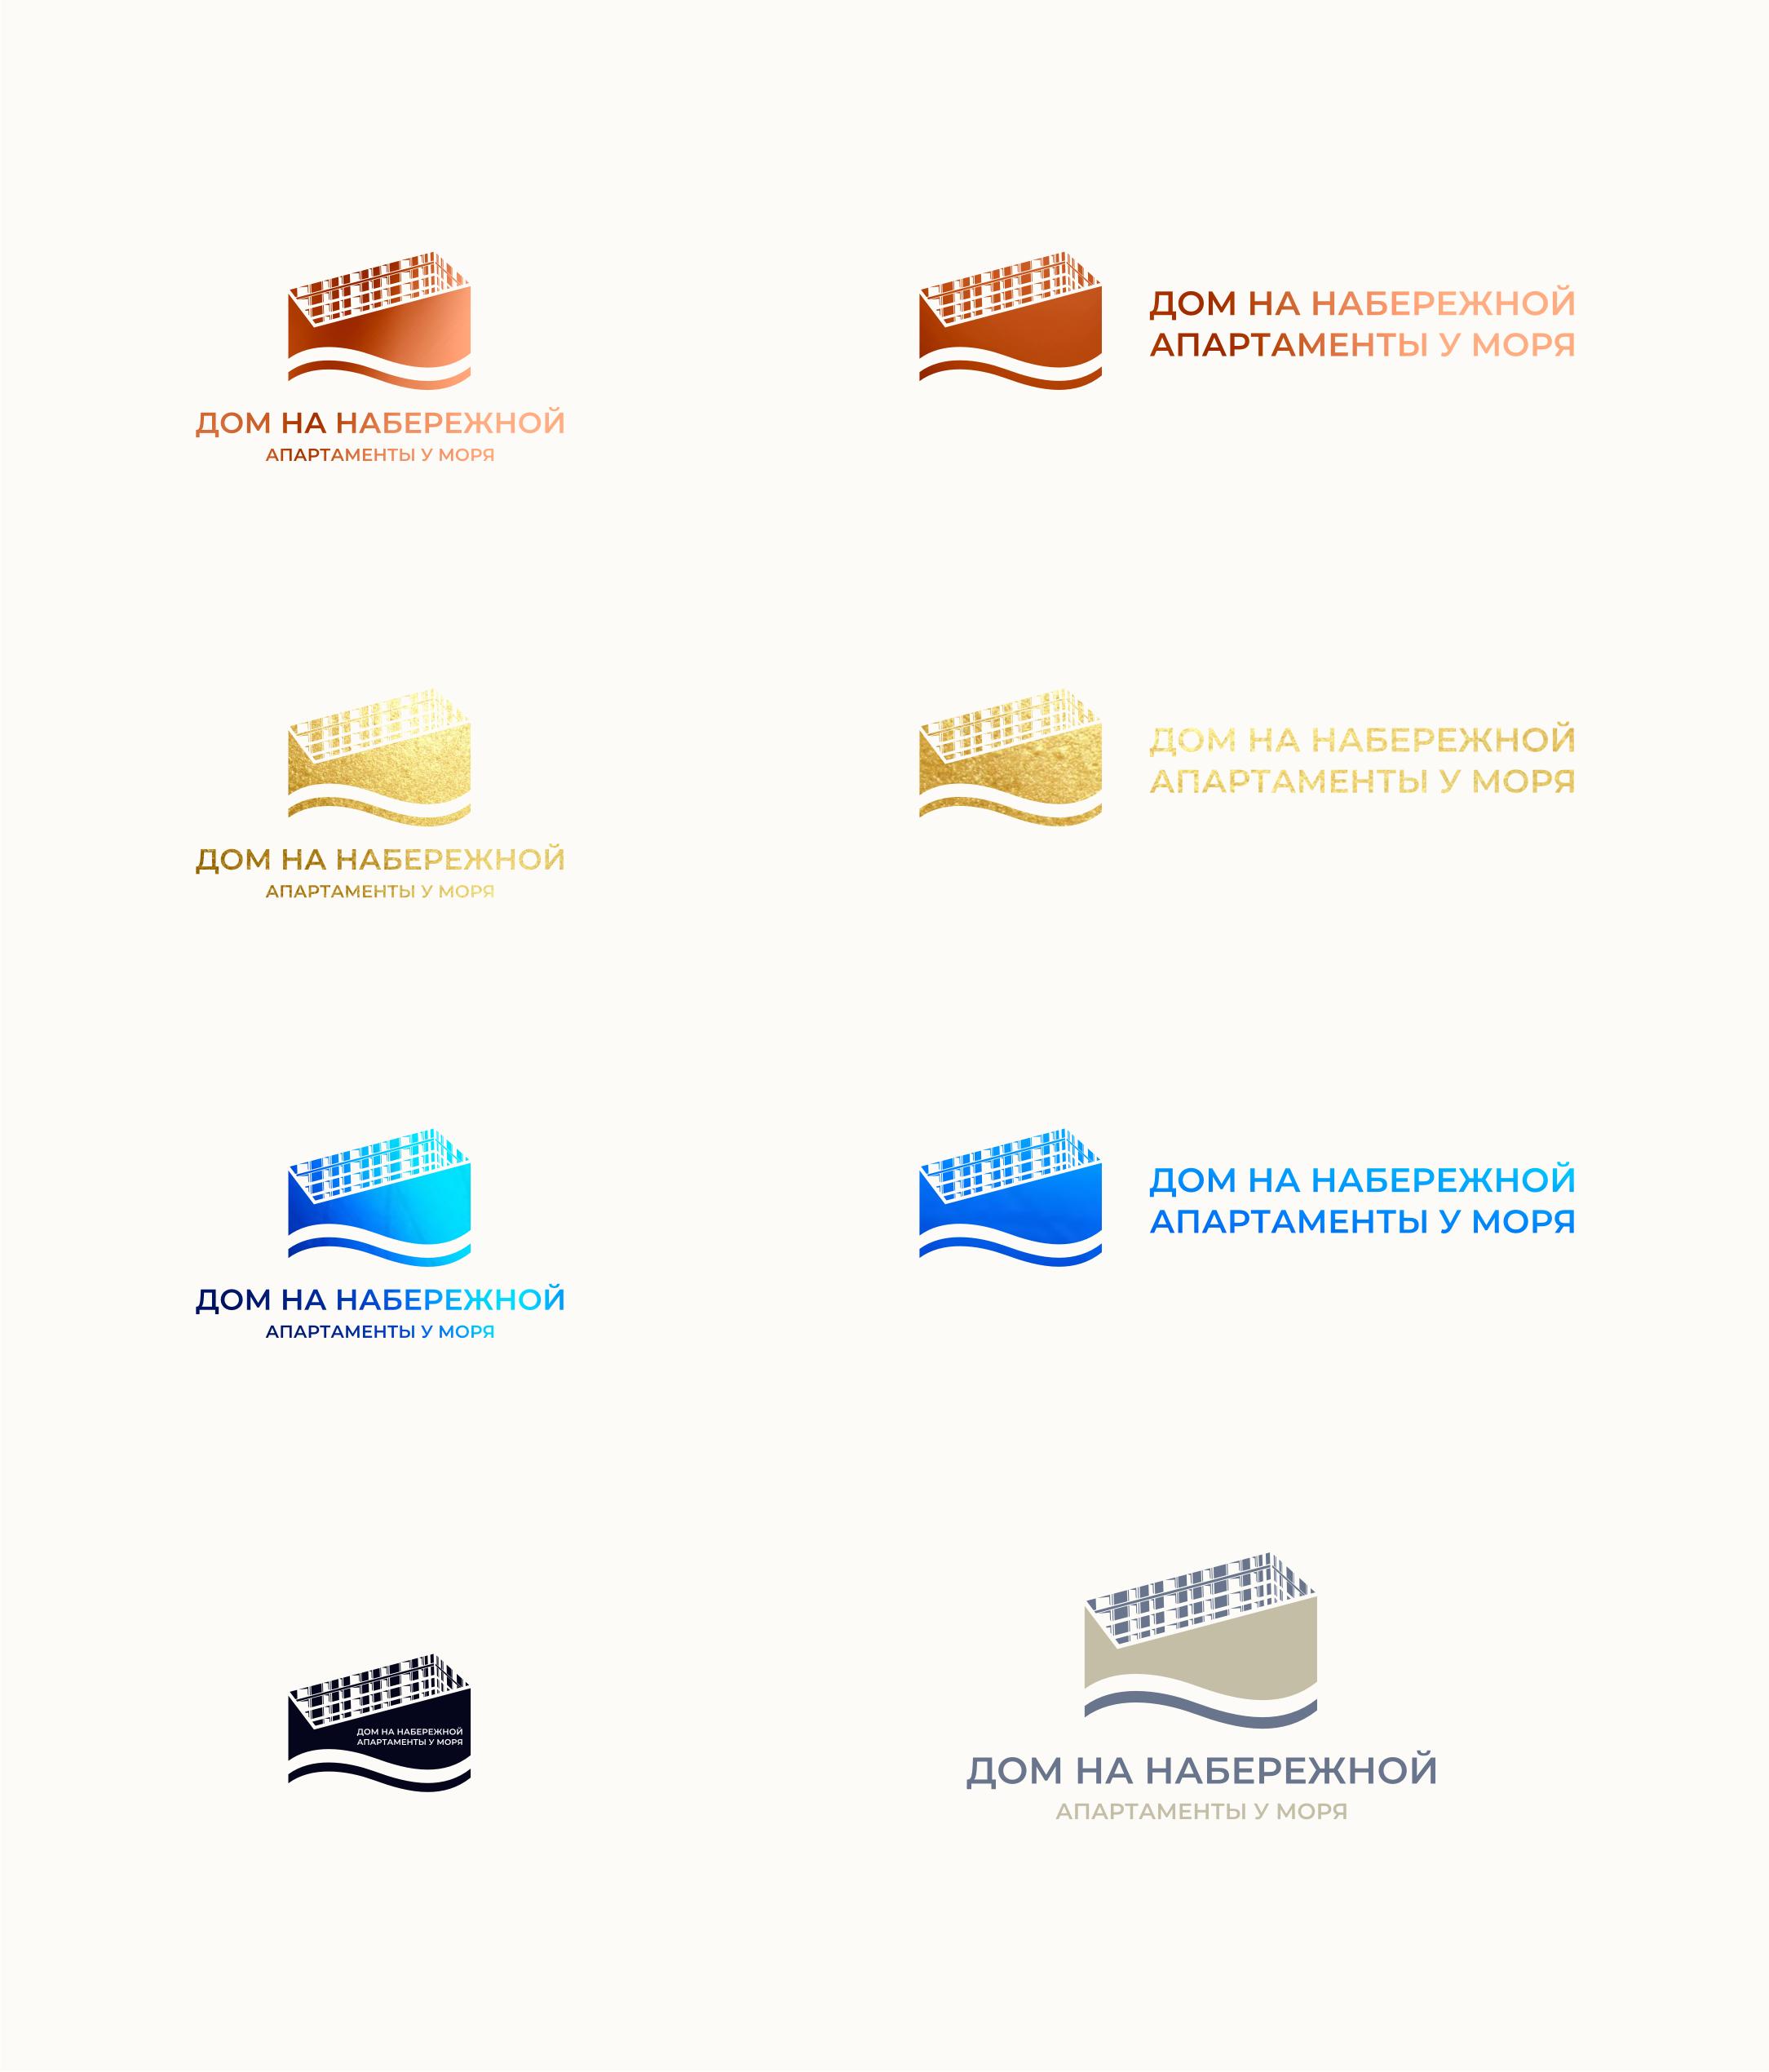 РАЗРАБОТКА логотипа для ЖИЛОГО КОМПЛЕКСА премиум В АНАПЕ.  фото f_0805de911285fcd6.png